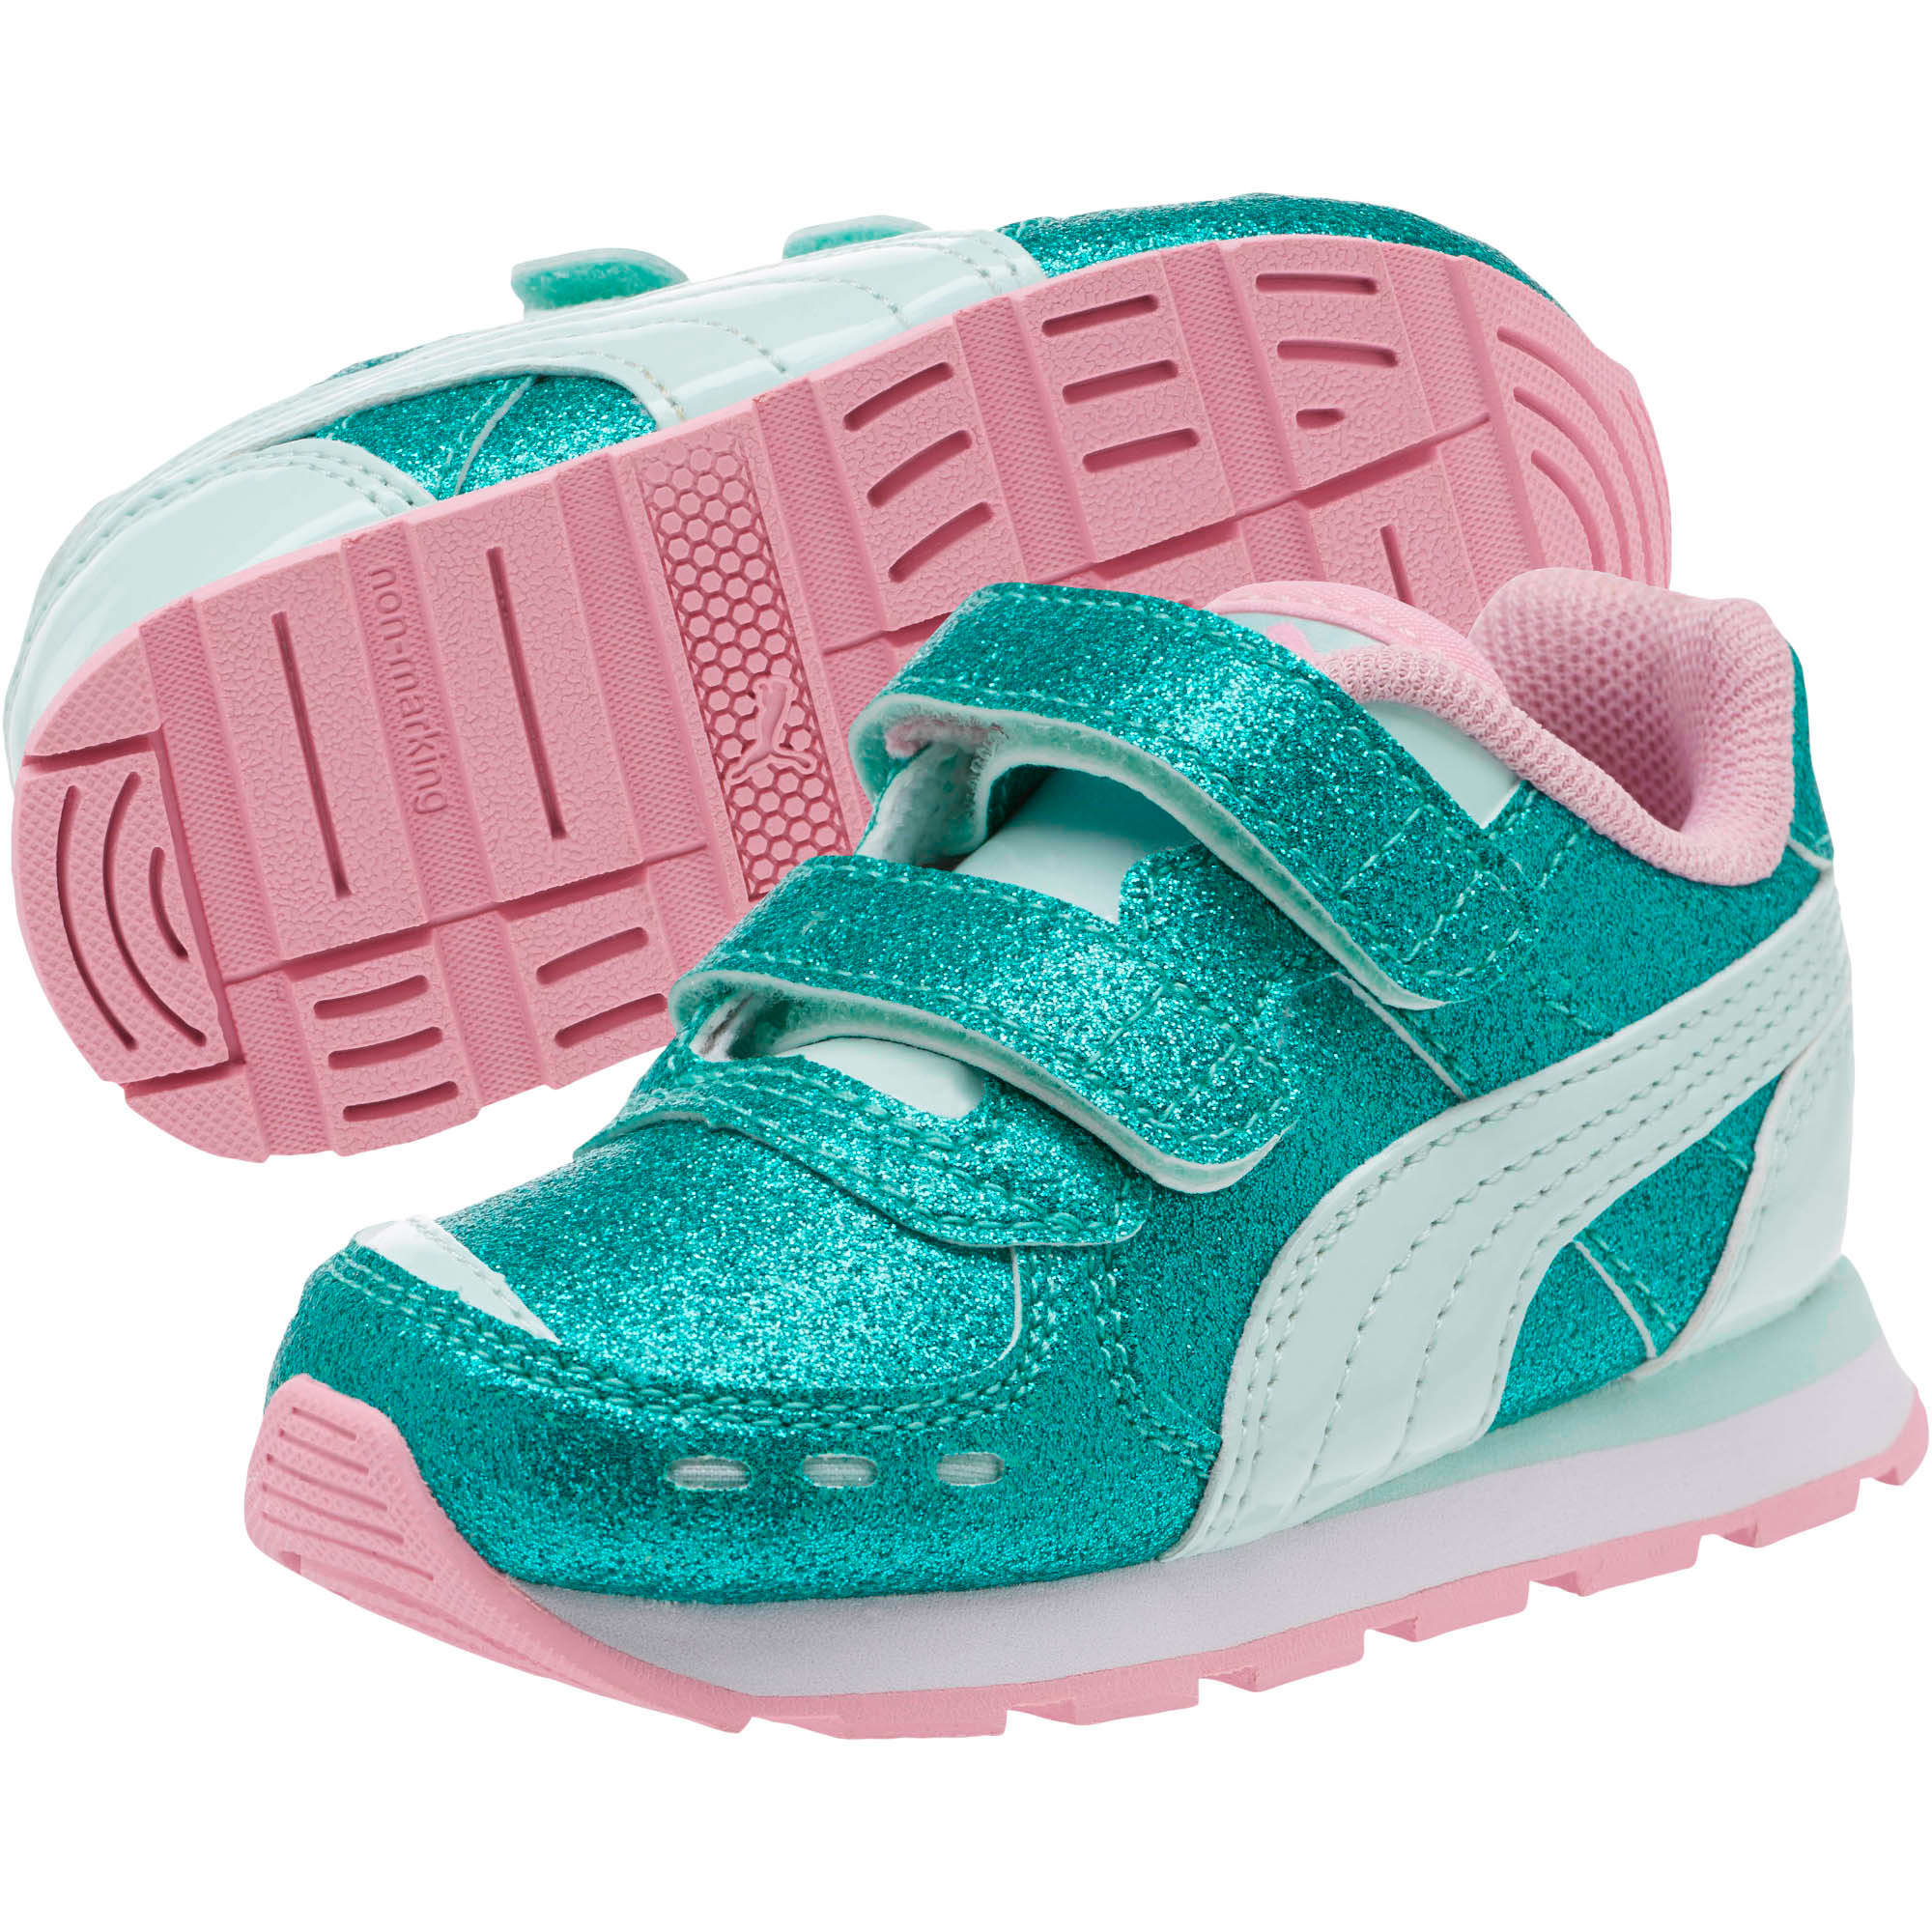 Thumbnail 2 of Vista Glitz Toddler Shoes, Fair Aqua-Pale Pink, medium